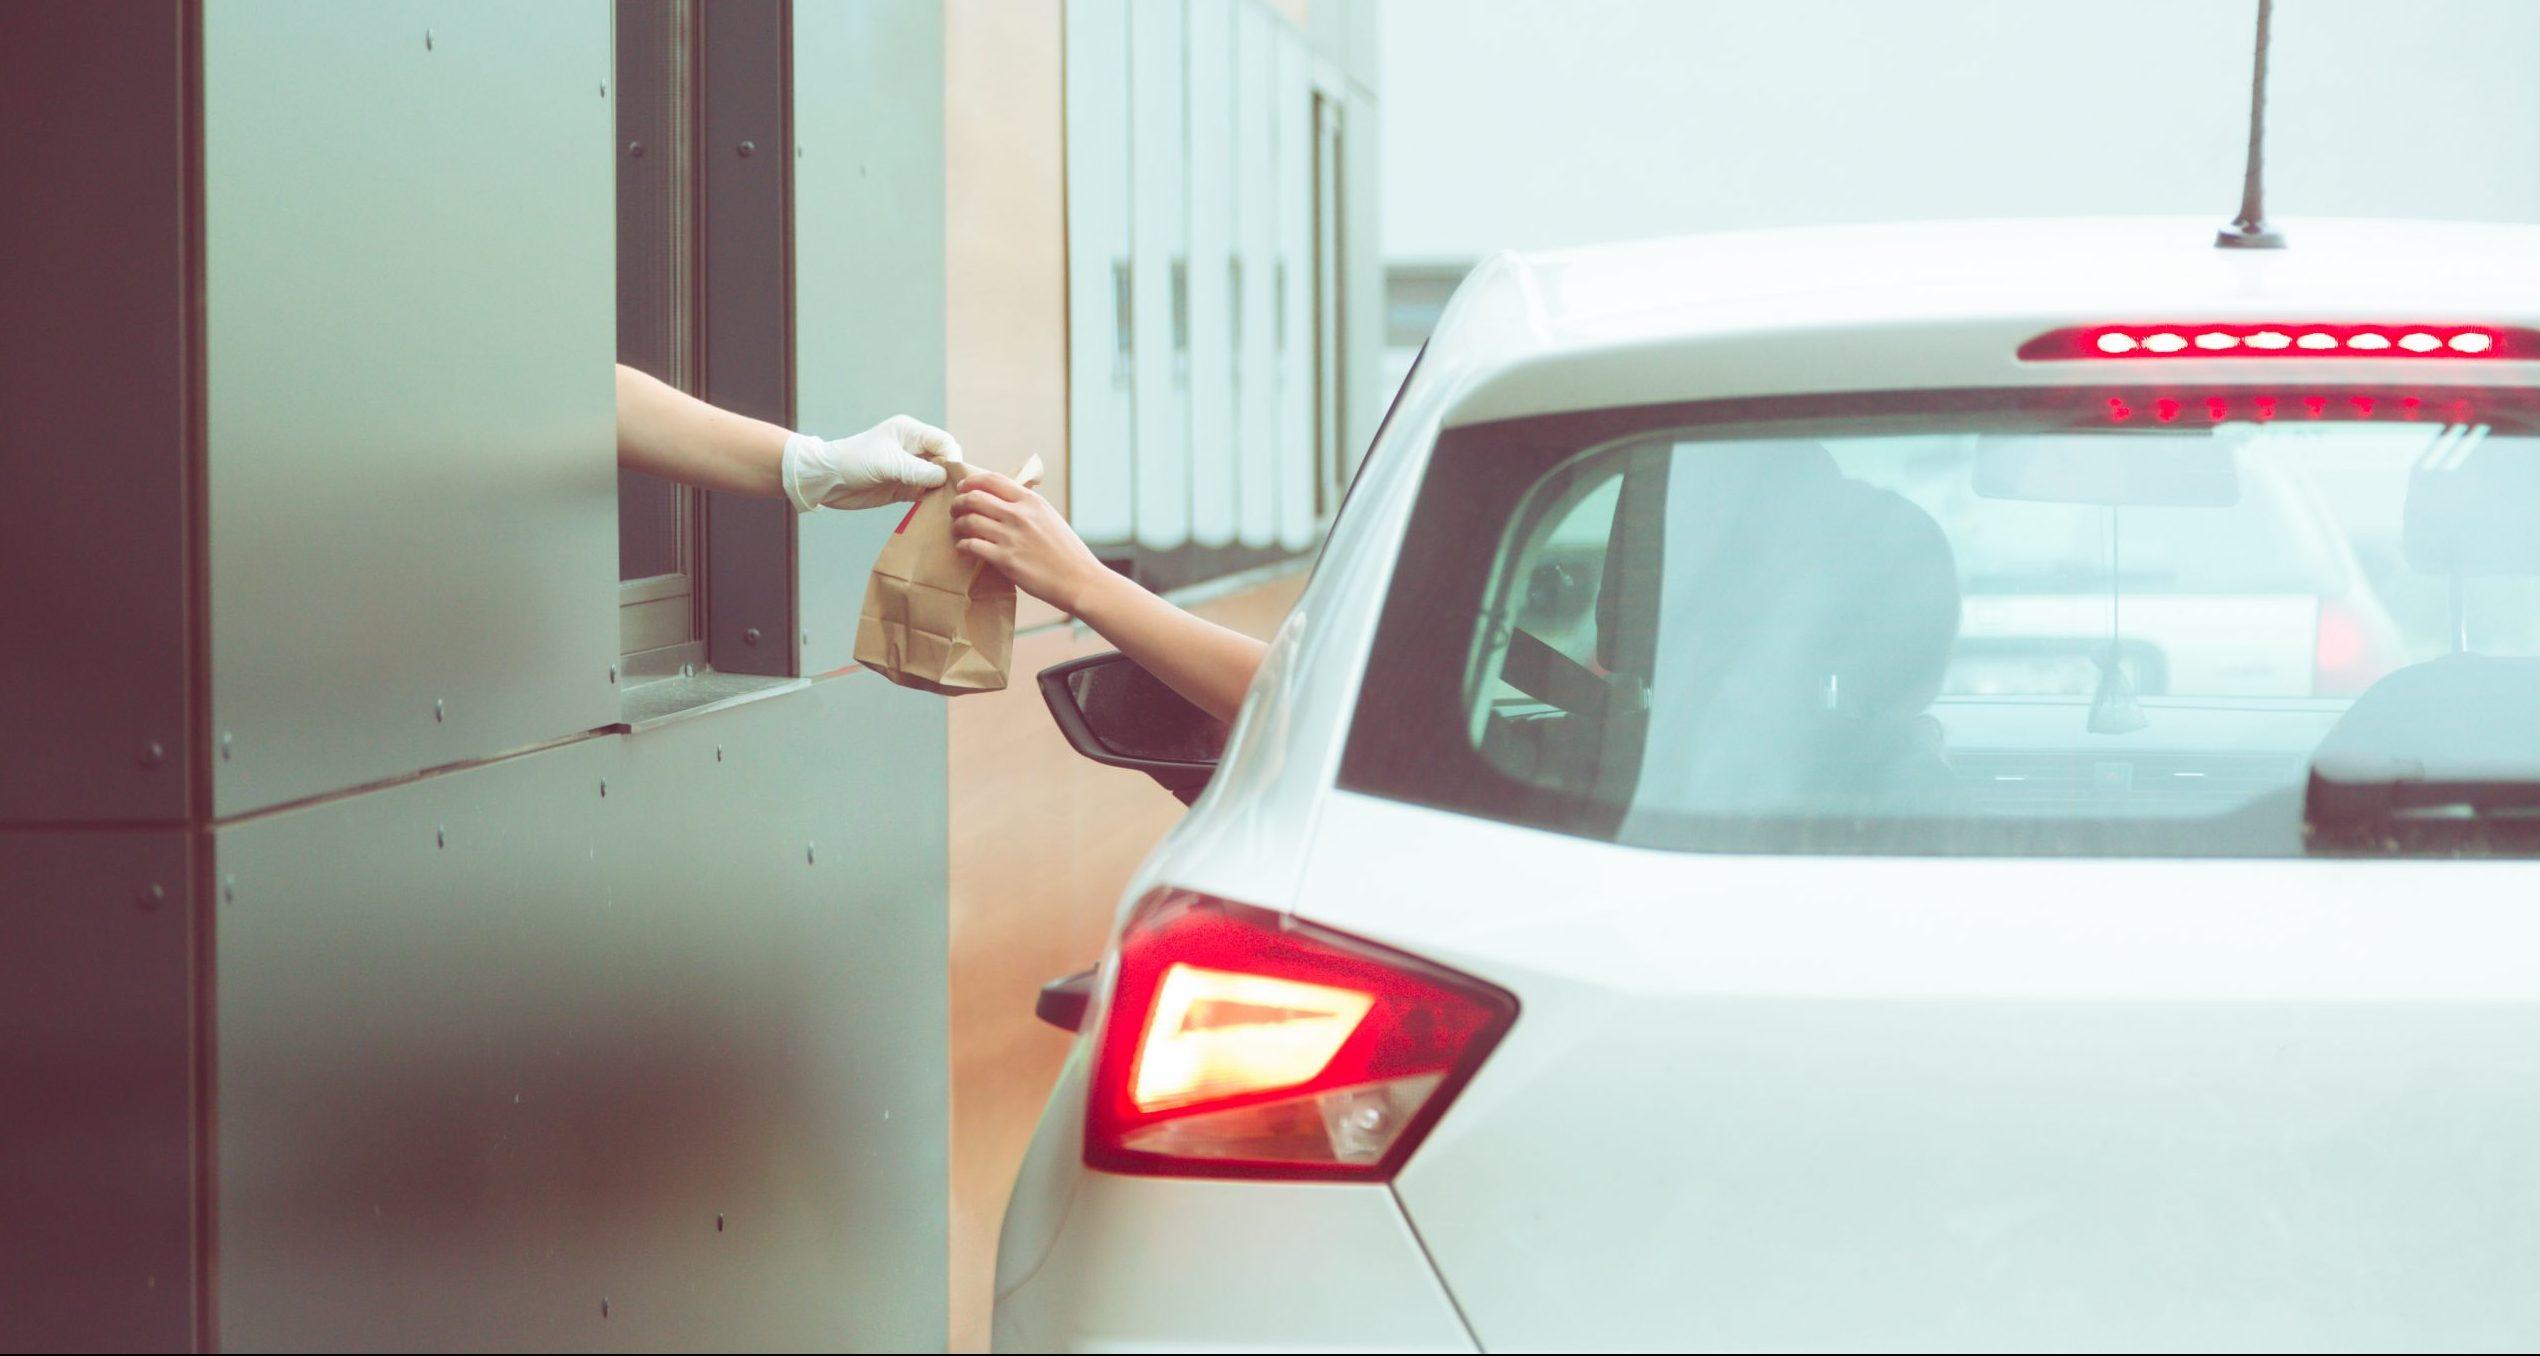 A person receiving a bag of food through a drive-through window